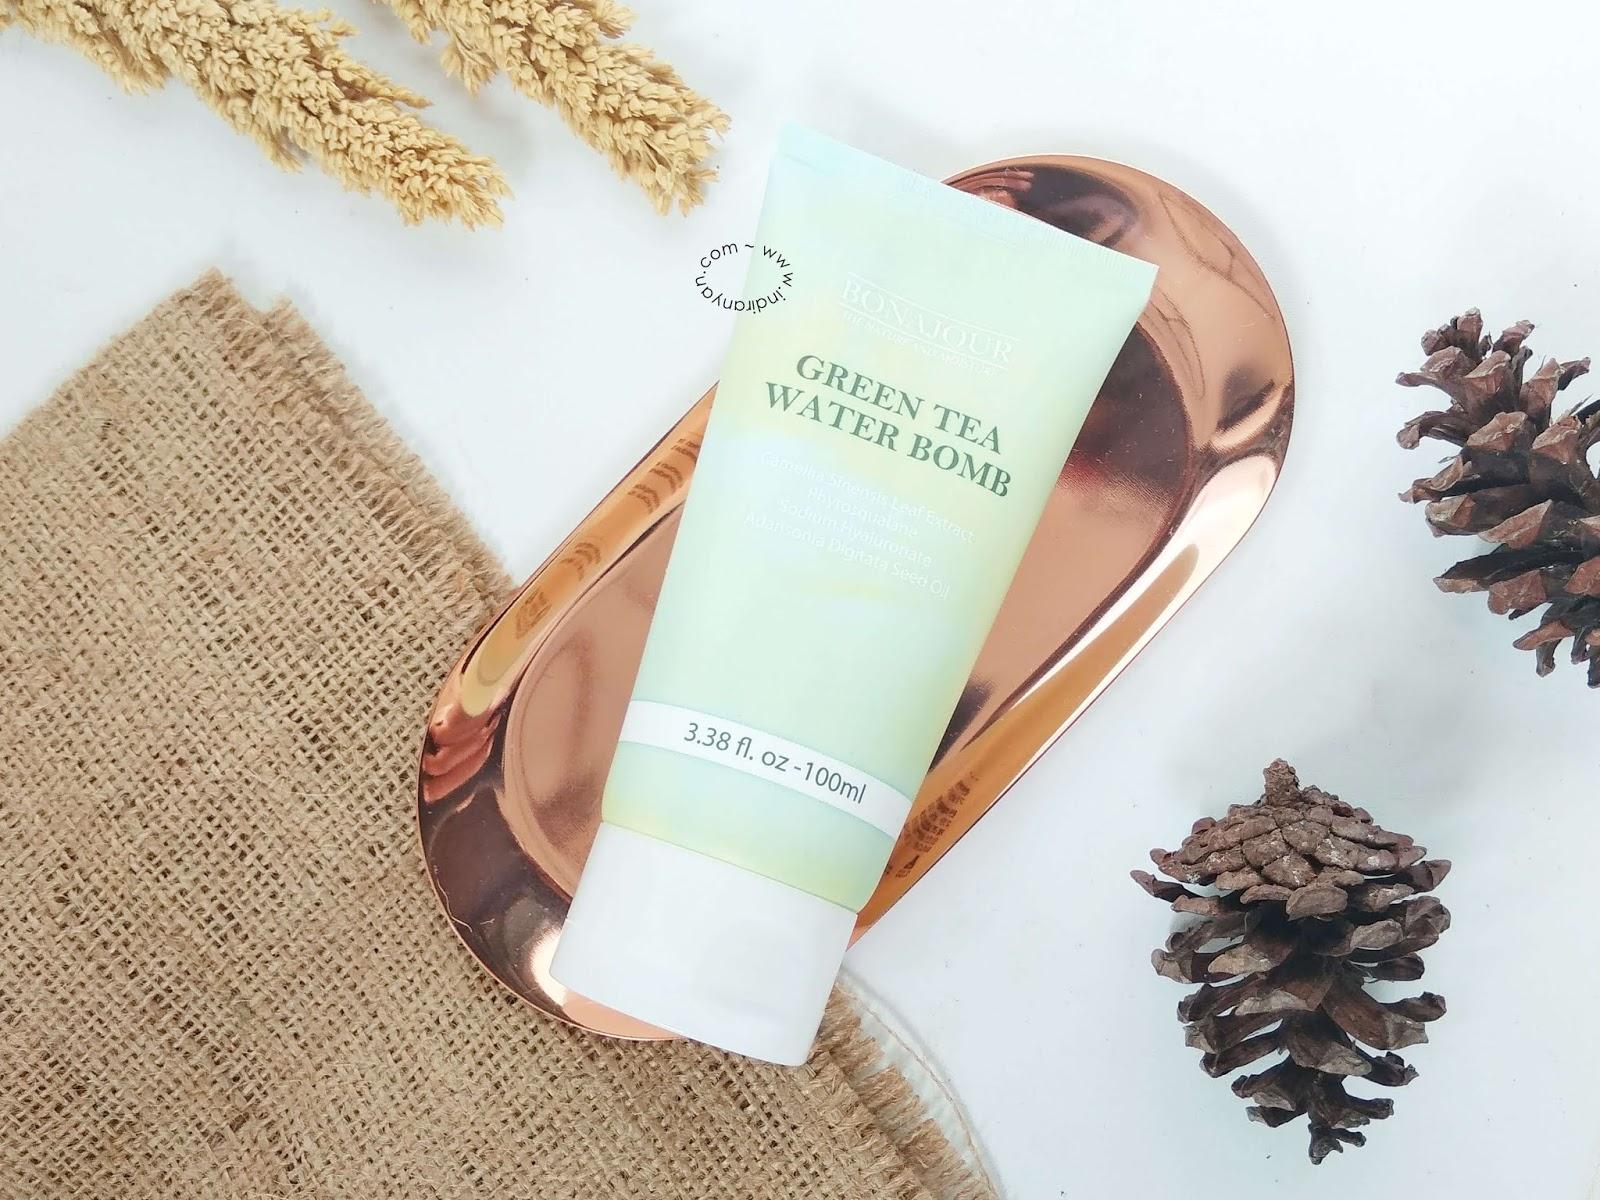 boanjour-green-tea-water-bomb-review-